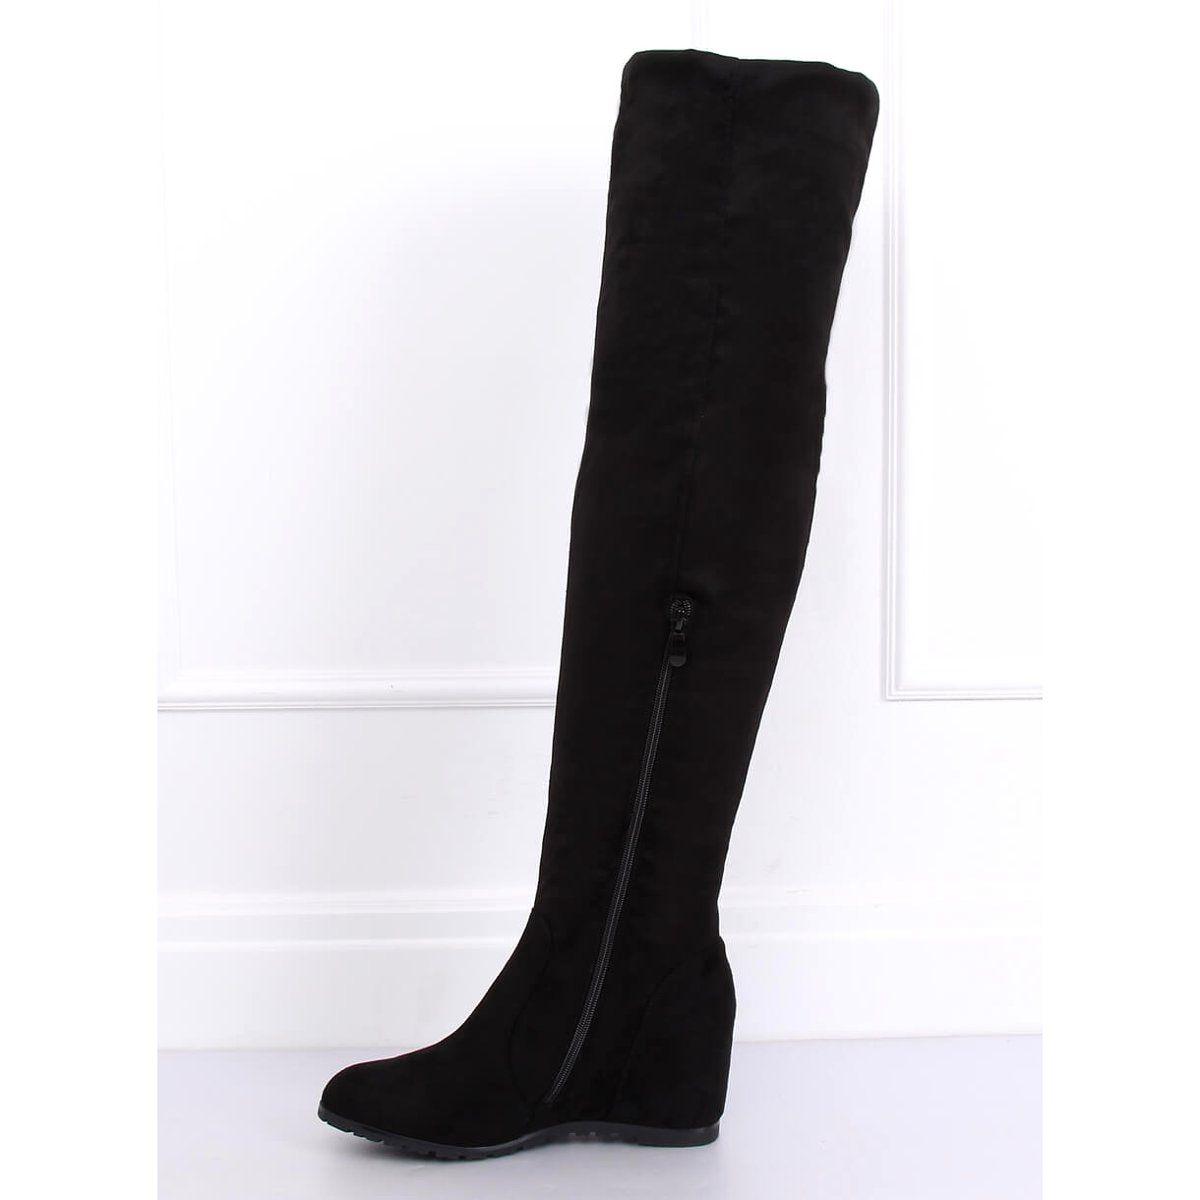 Muszkieterki Na Koturnie Czarne Pe108 Black Over Knee Boot Shoes Boots